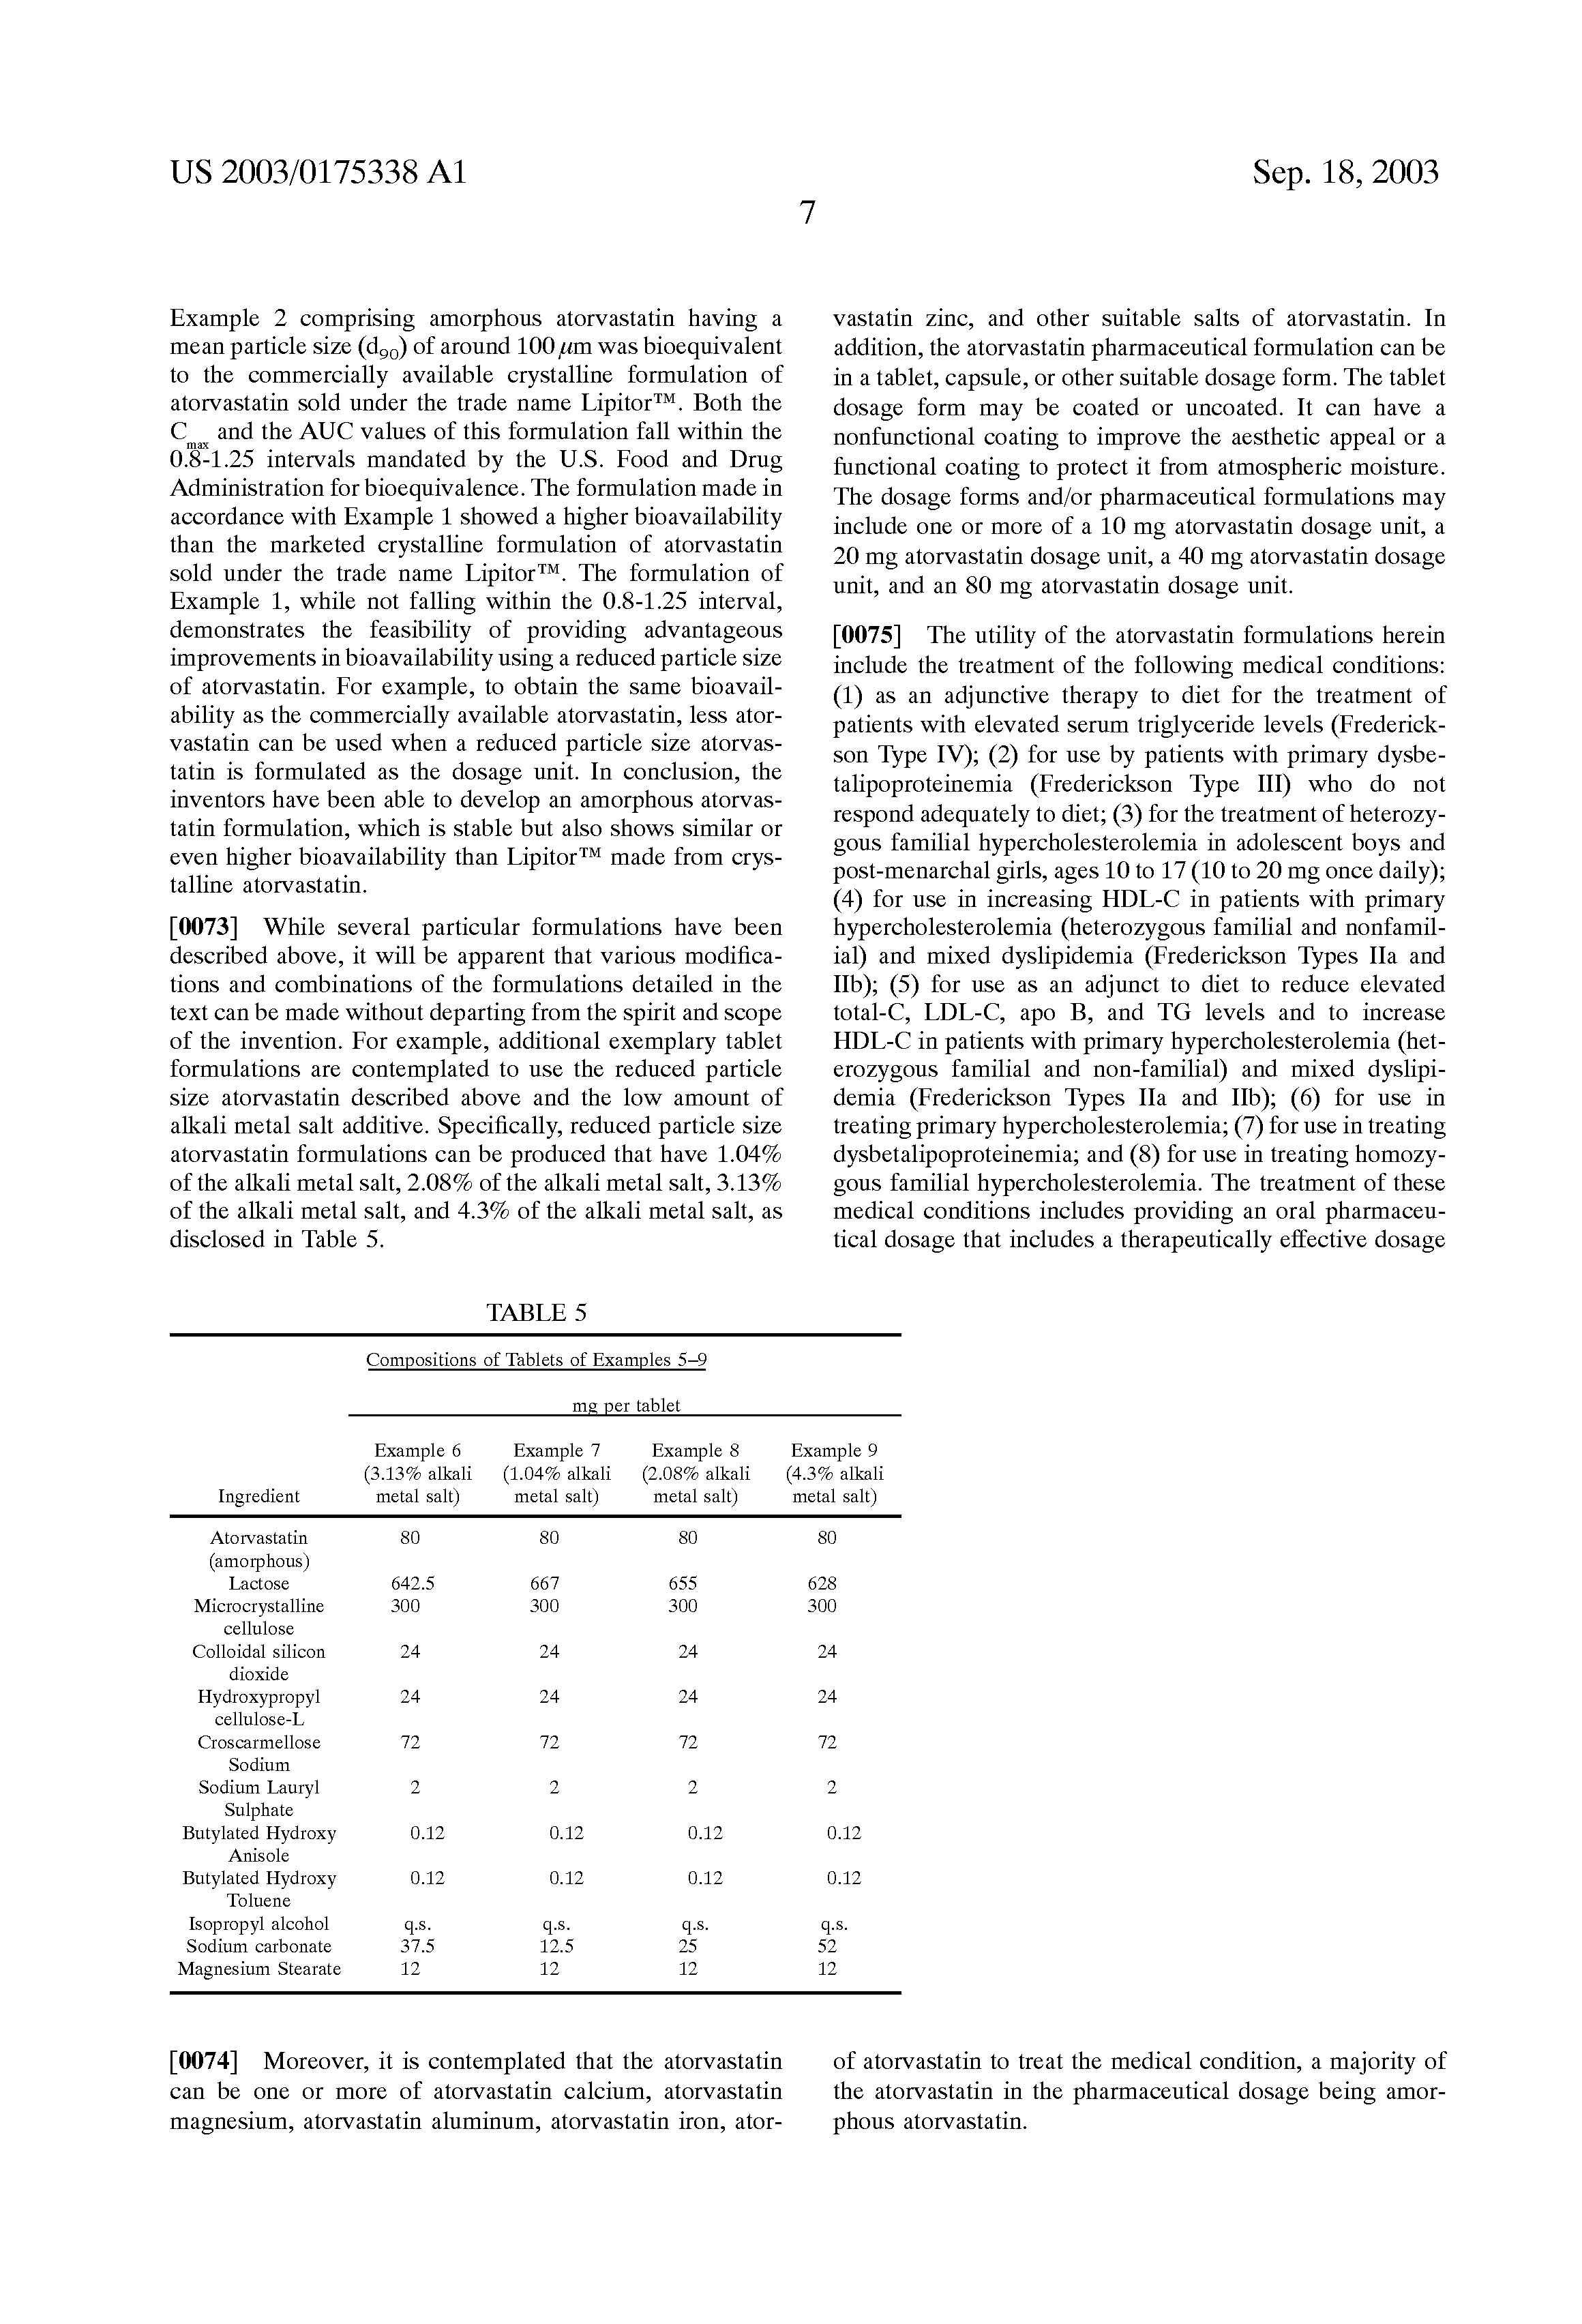 Atorvastatin 10 mg tabletten.doc - Patent Drawing